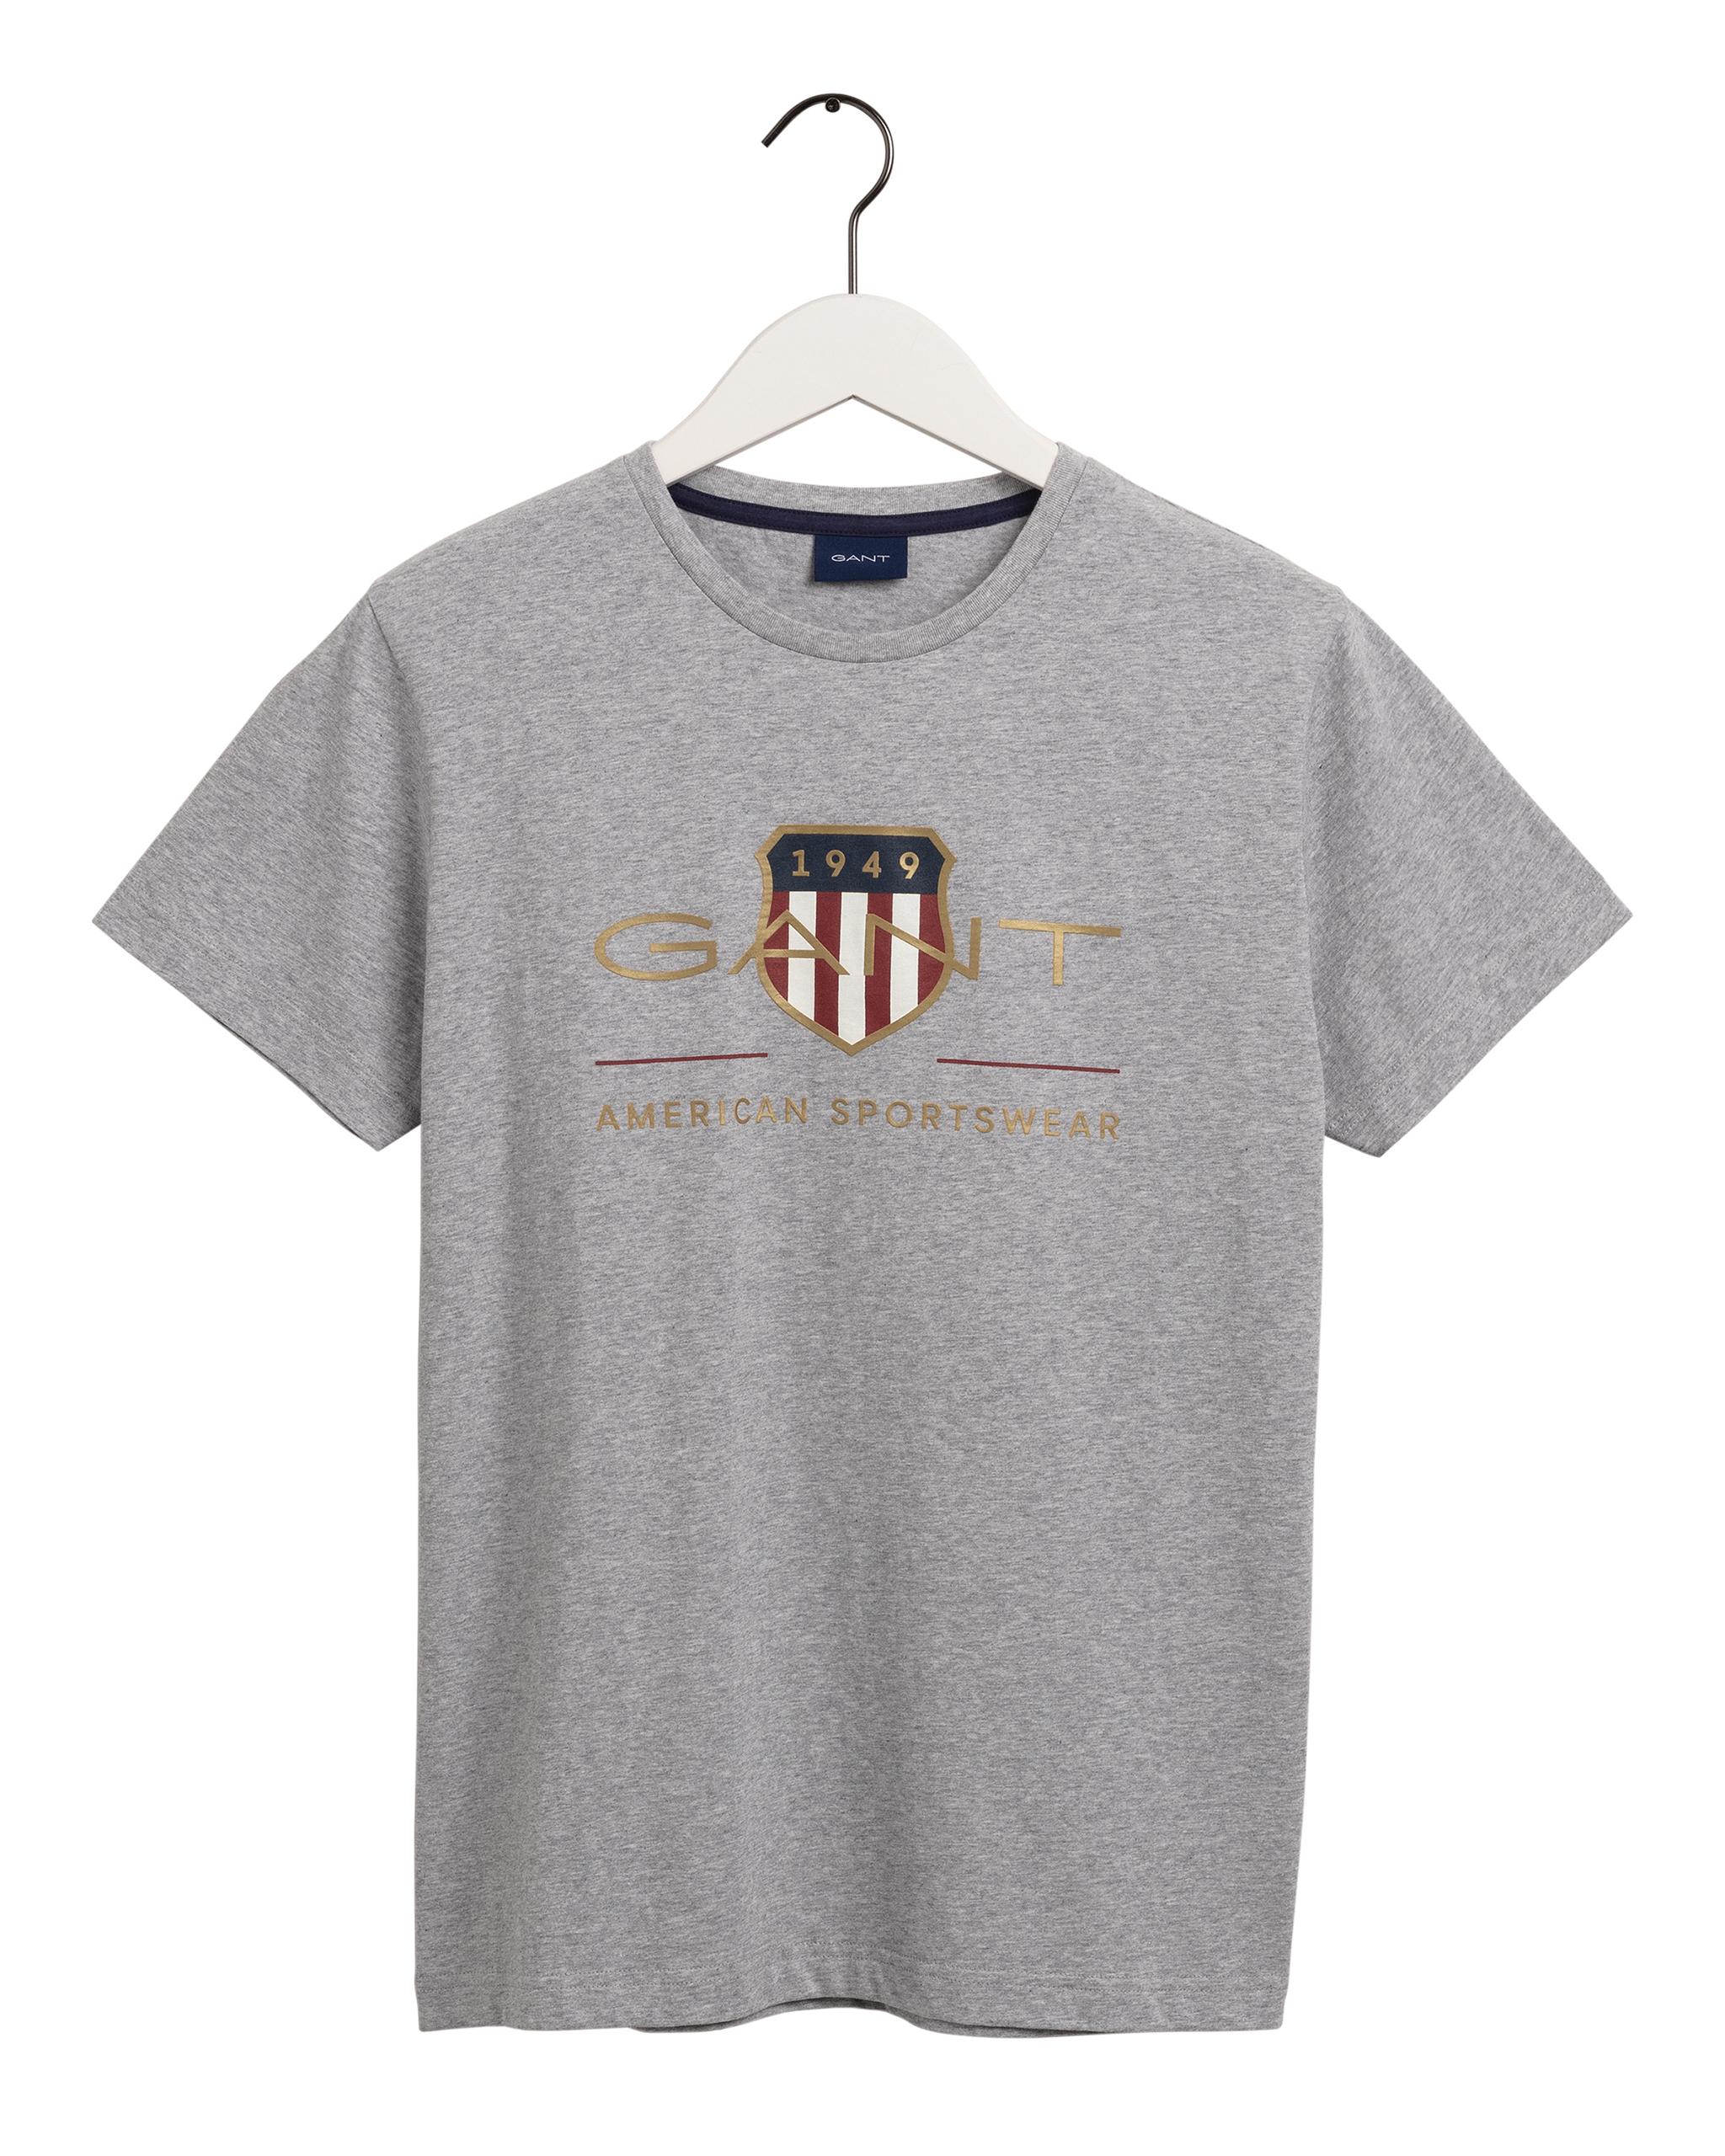 Gant Archive Shield t-shirt, grey melange, large